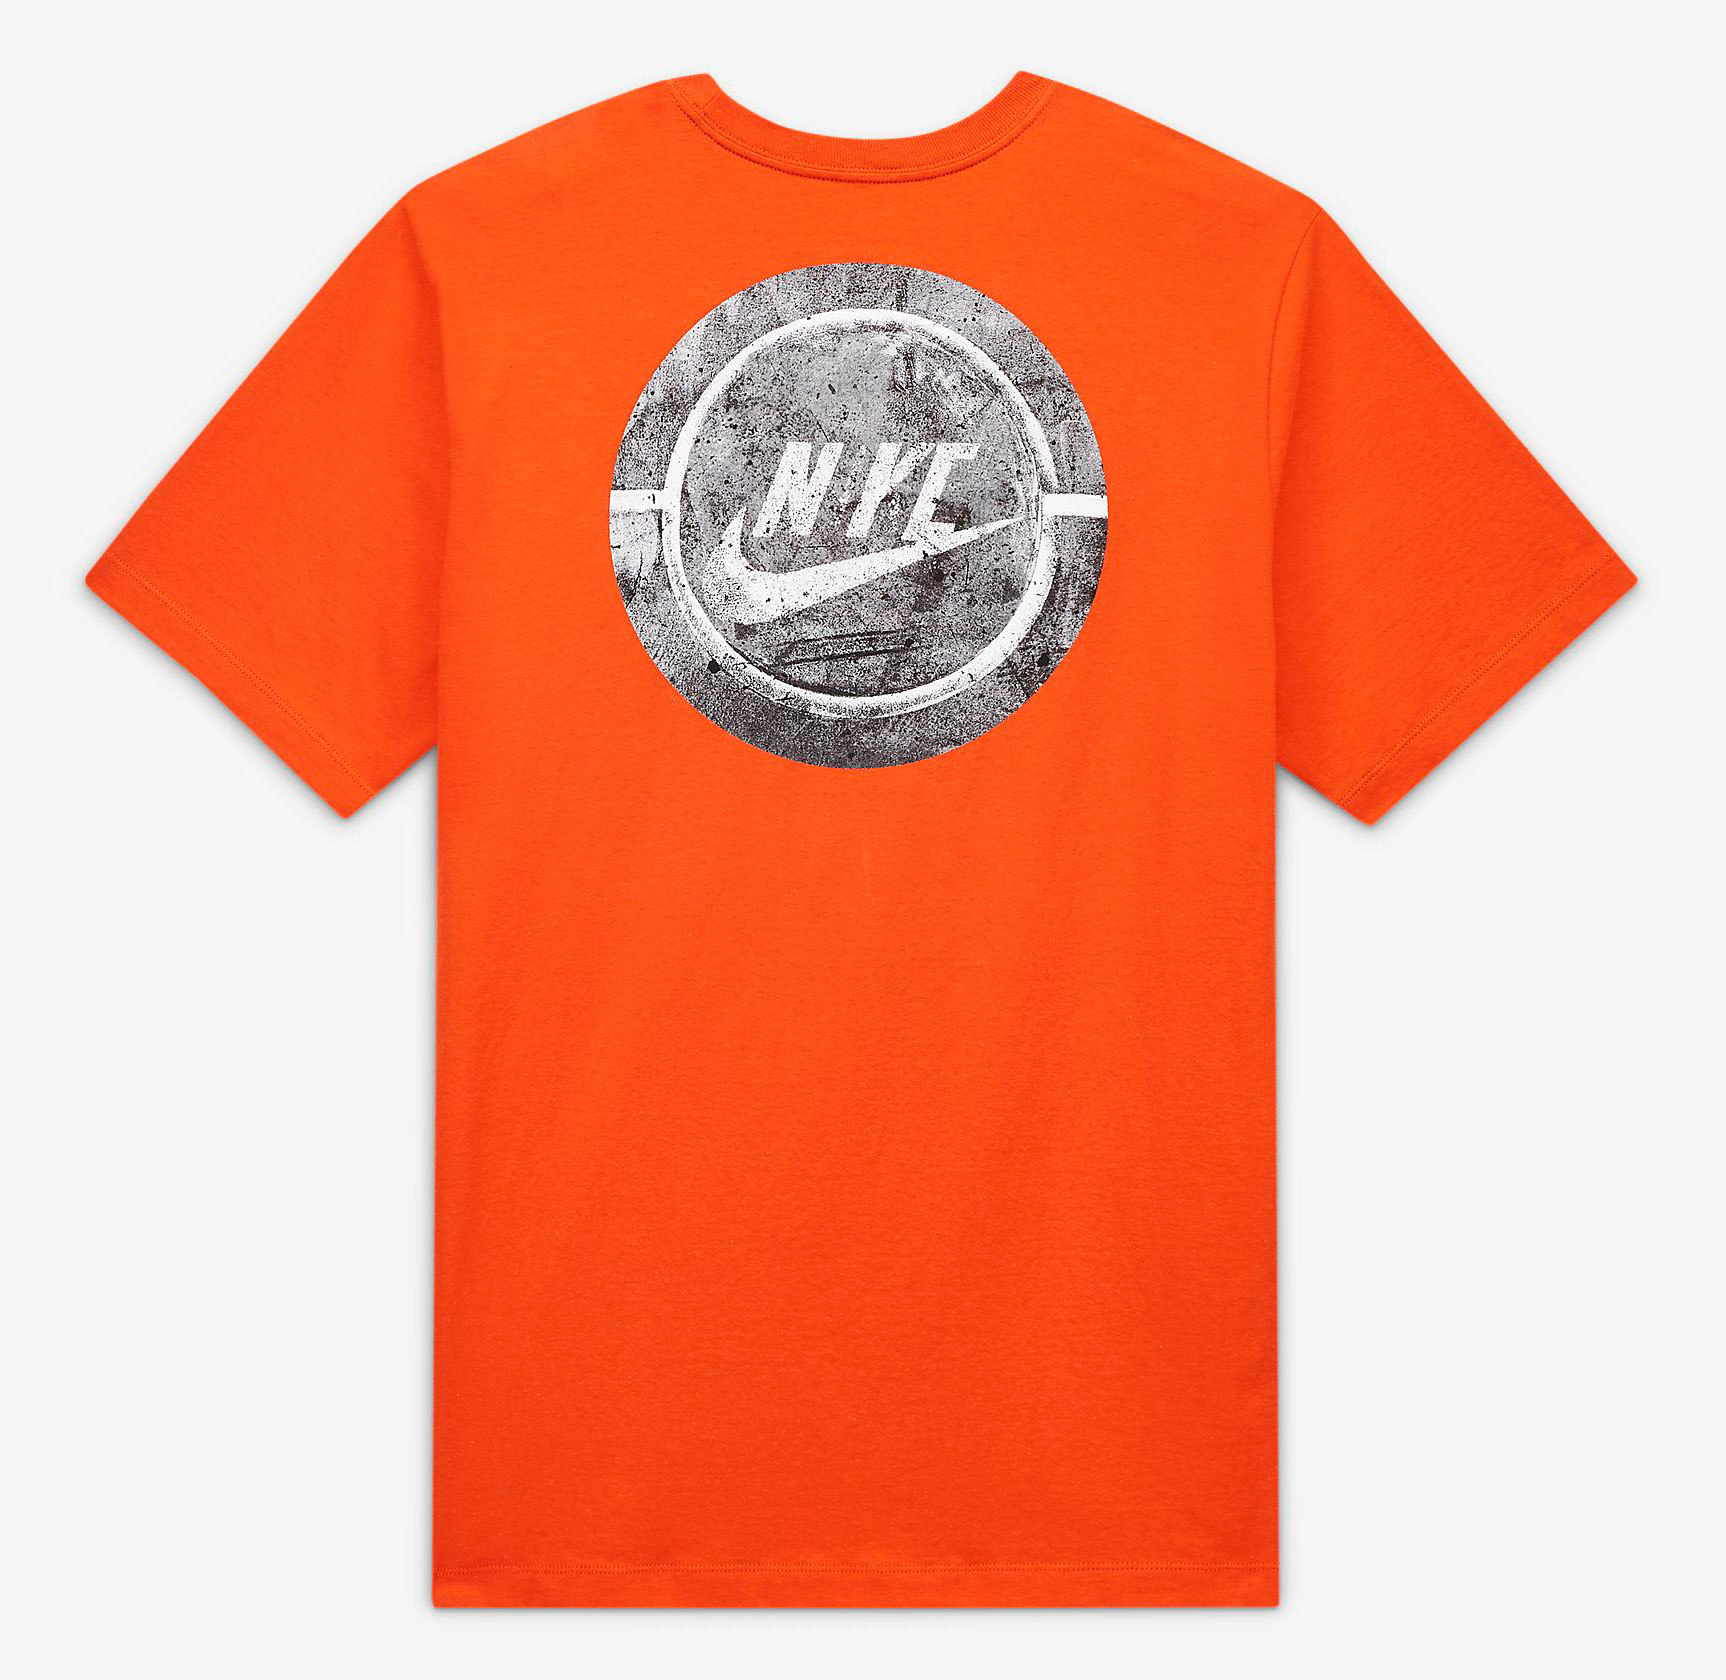 nike-sportswear-nyc-team-orange-t-shirt-2